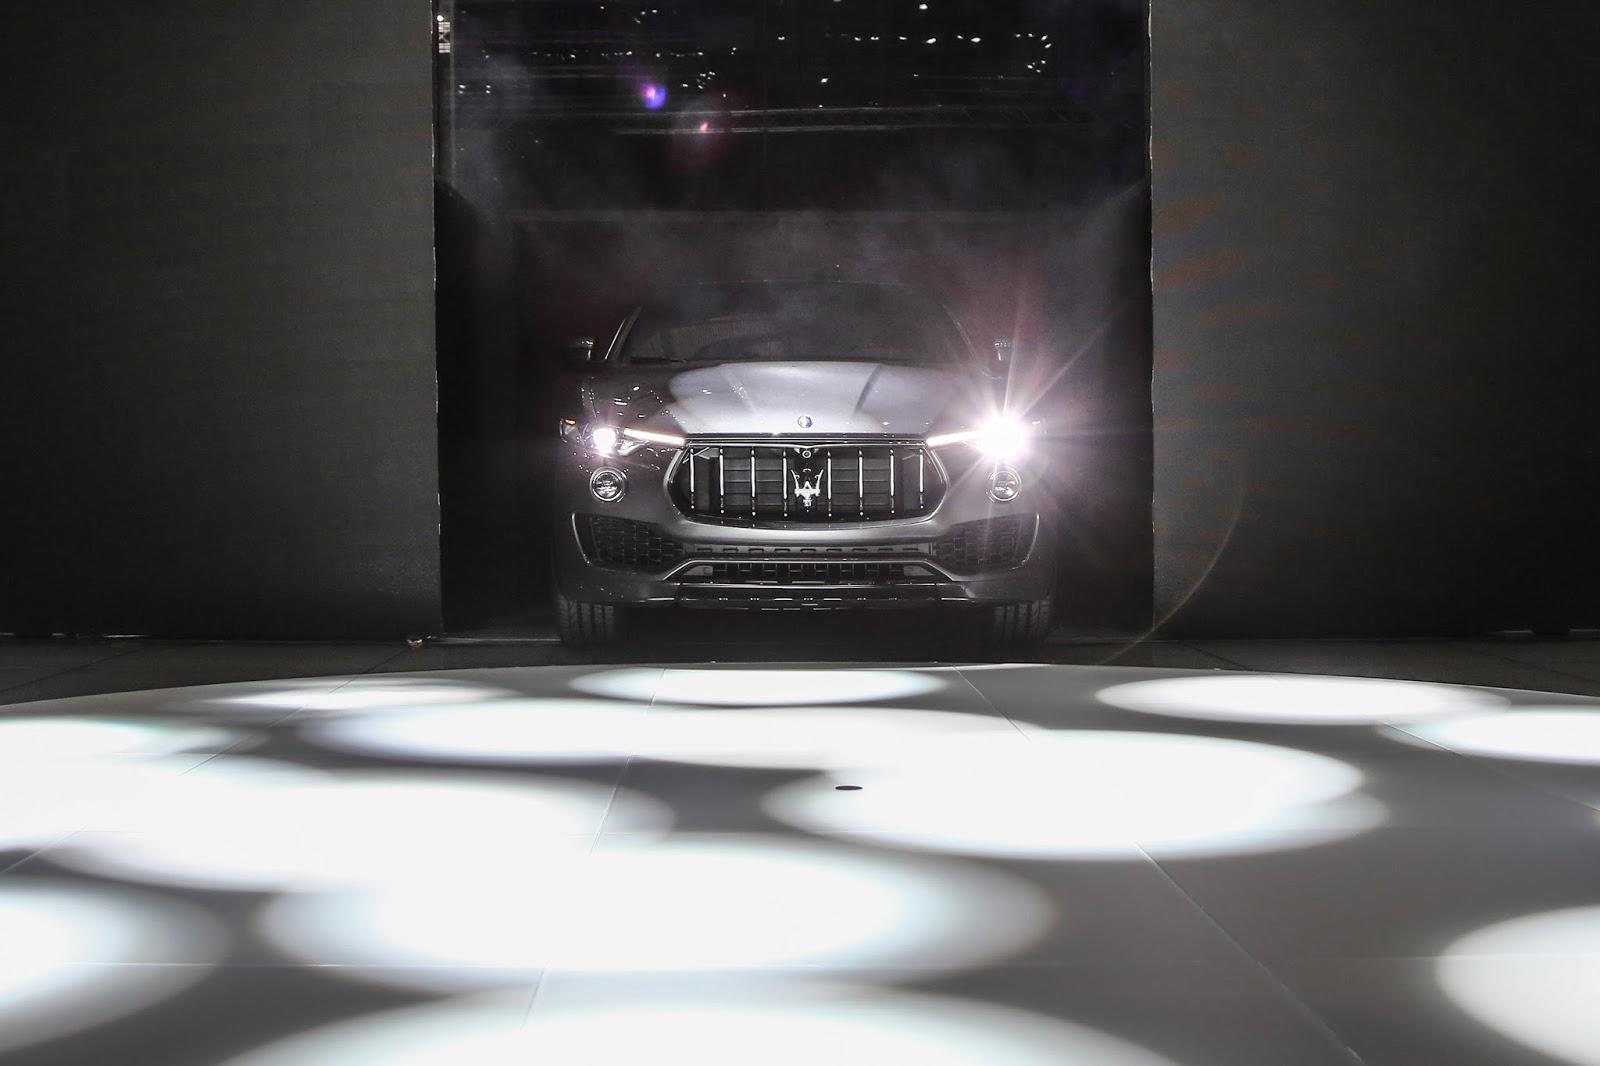 56d580811d5ea Τα πάντα για το πρώτο SUV της Maserati autoshow, Maserati, Maserati Ghibli, Maserati Ghibli S, Maserati Ghibli S Q4, Maserati GranTurismo, Maserati Levante, Maserati Levante S, Maserati Quattroporte, zblog